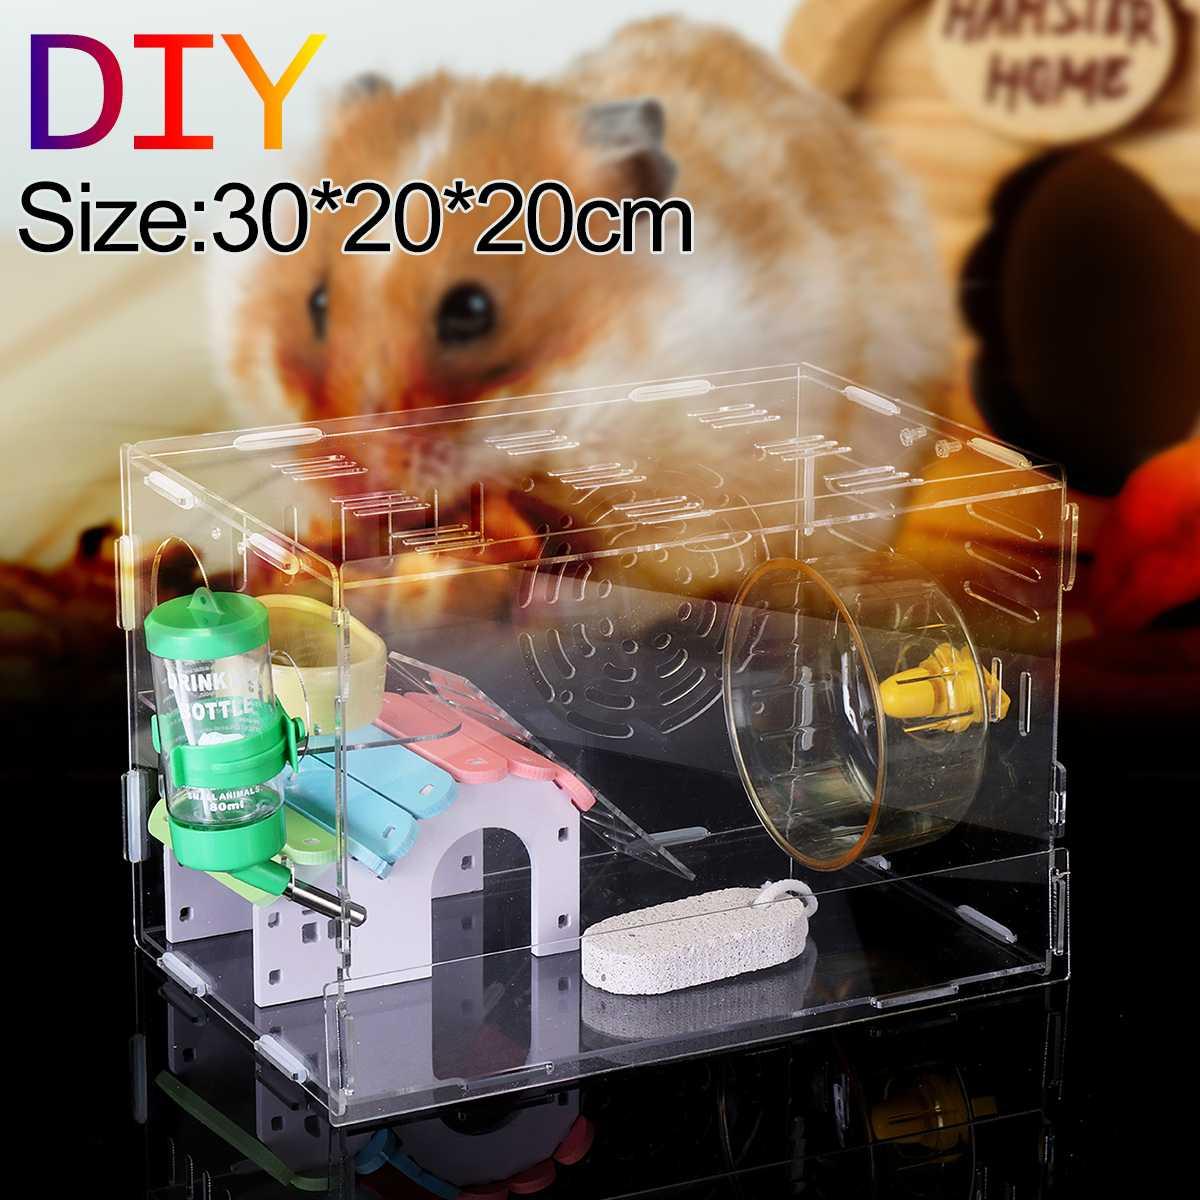 30x20x20cm Transparent DIY Hamster Cage font b Pet b font Cage Acrylic Single Layer Traveling Portable